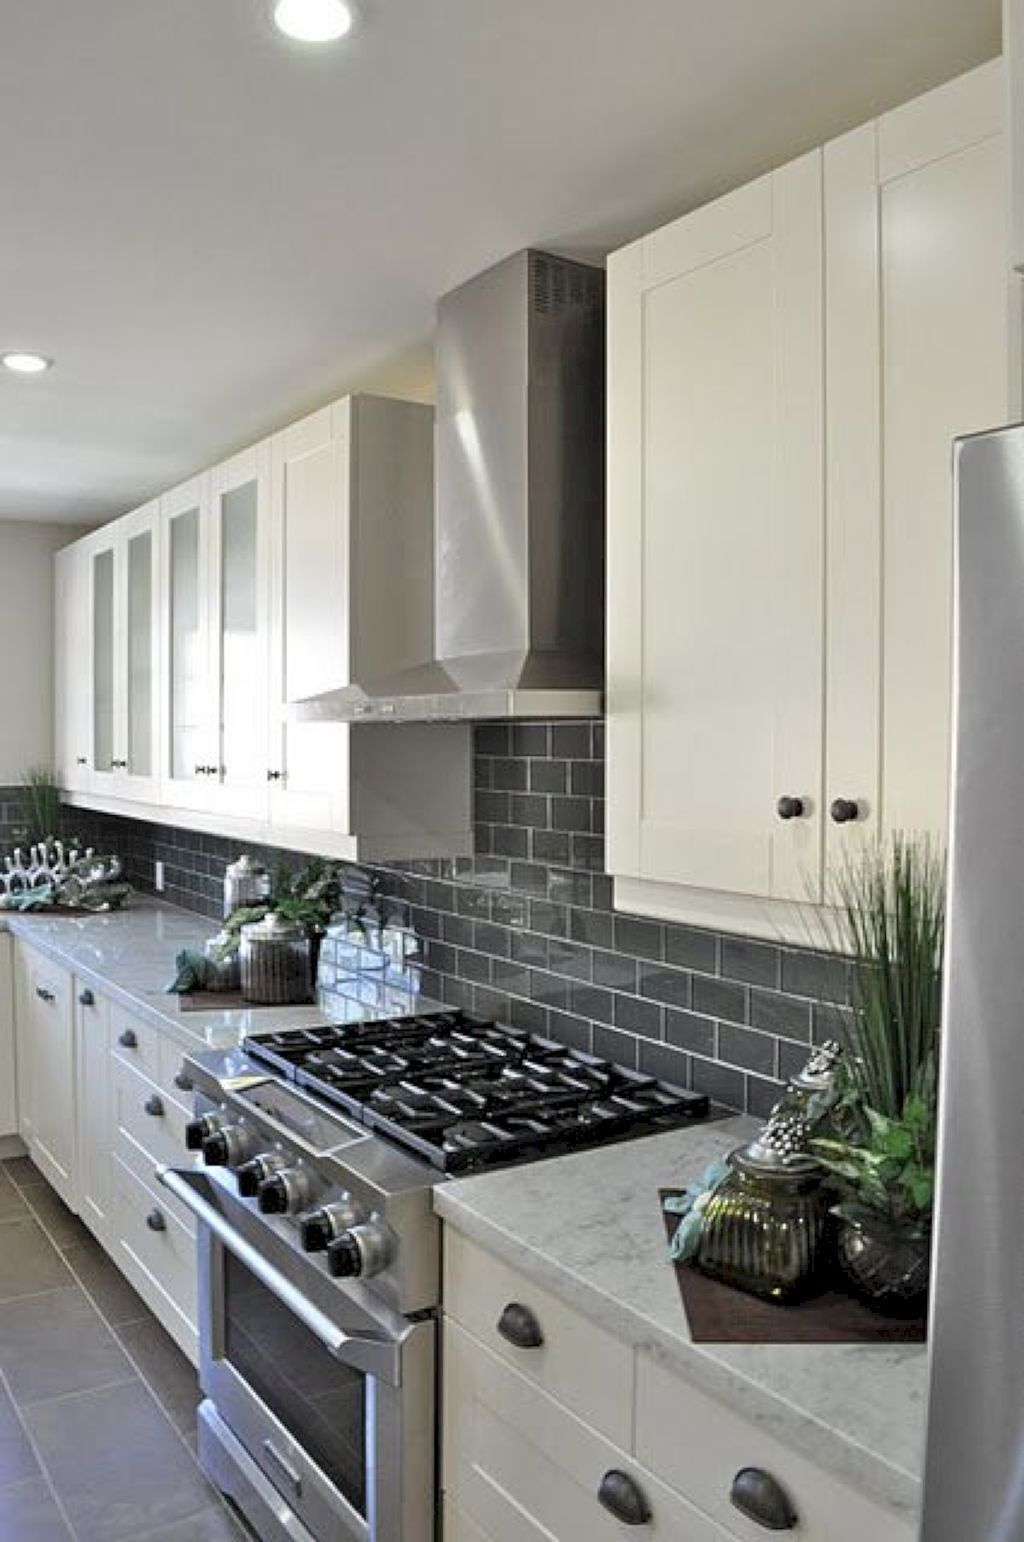 - 6 Outstanding Kitchen Backsplash Ideas That Make You Feel Like A